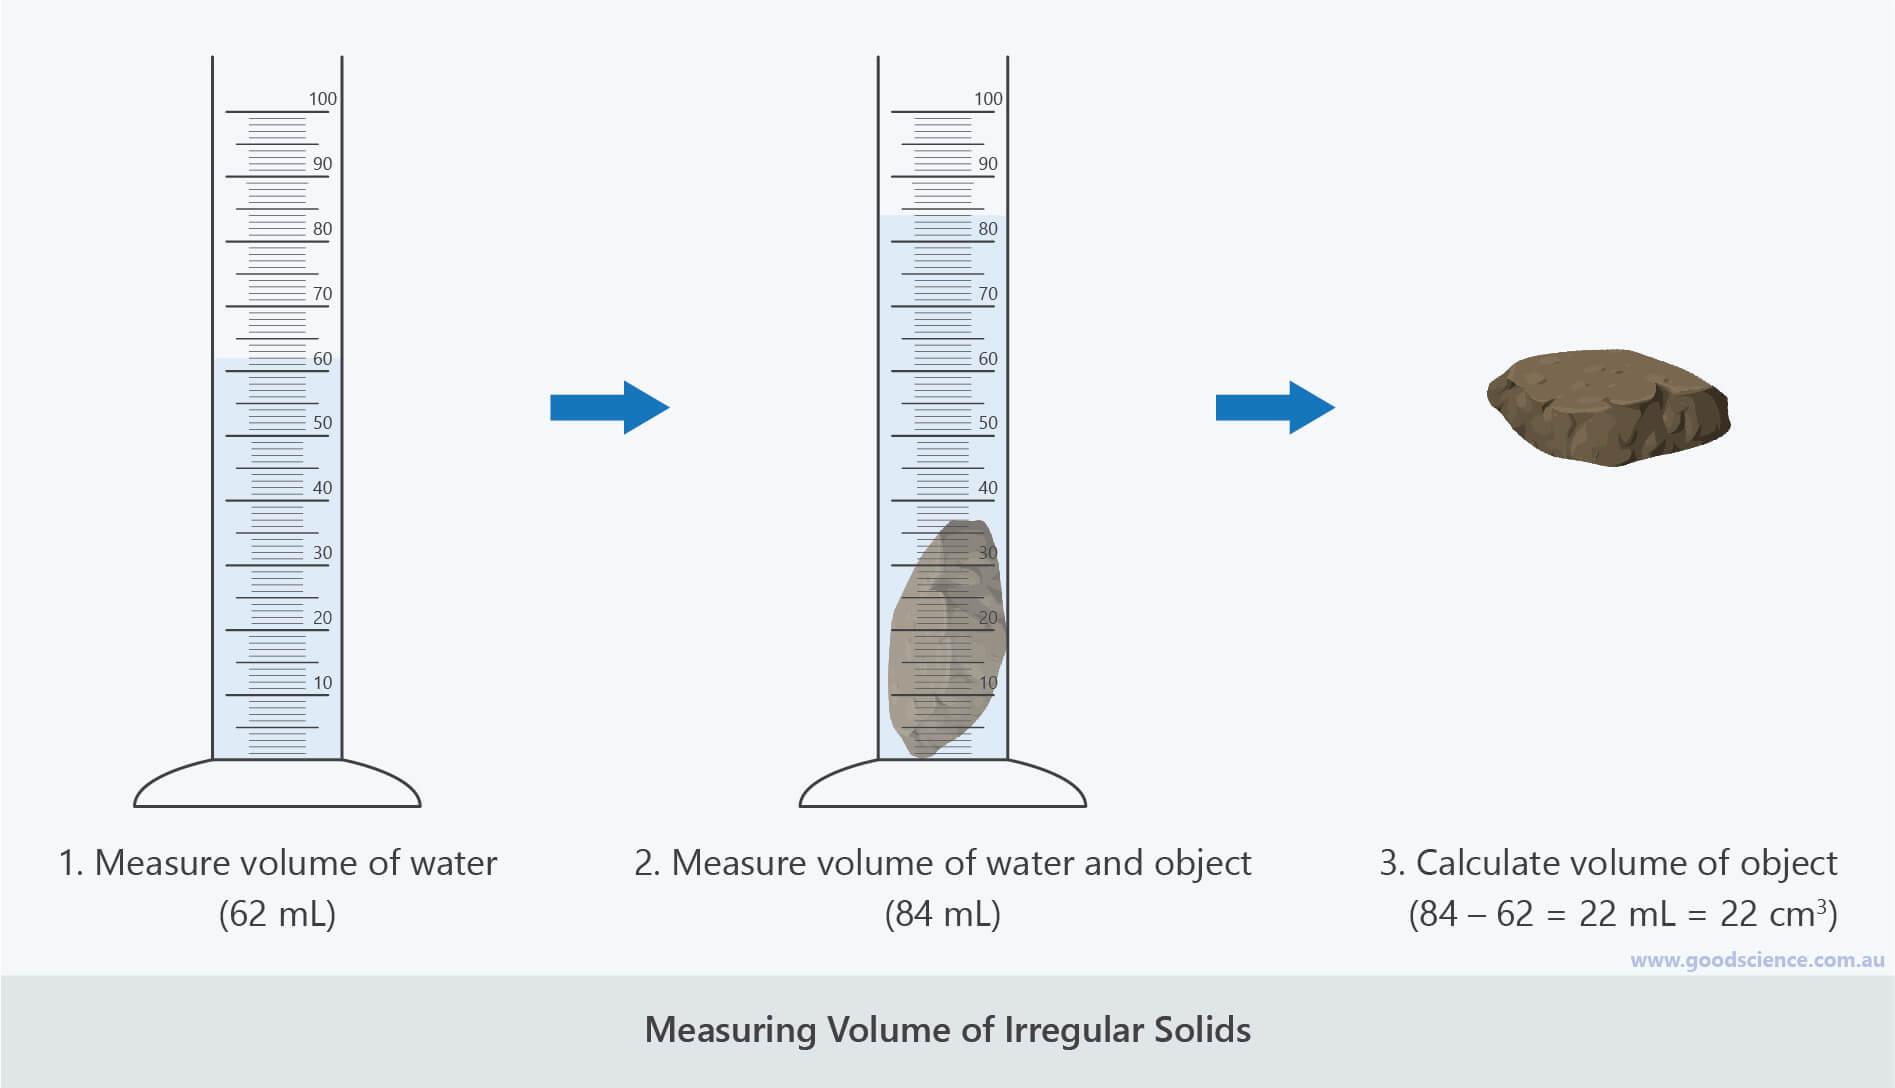 measuring volume irregular solids